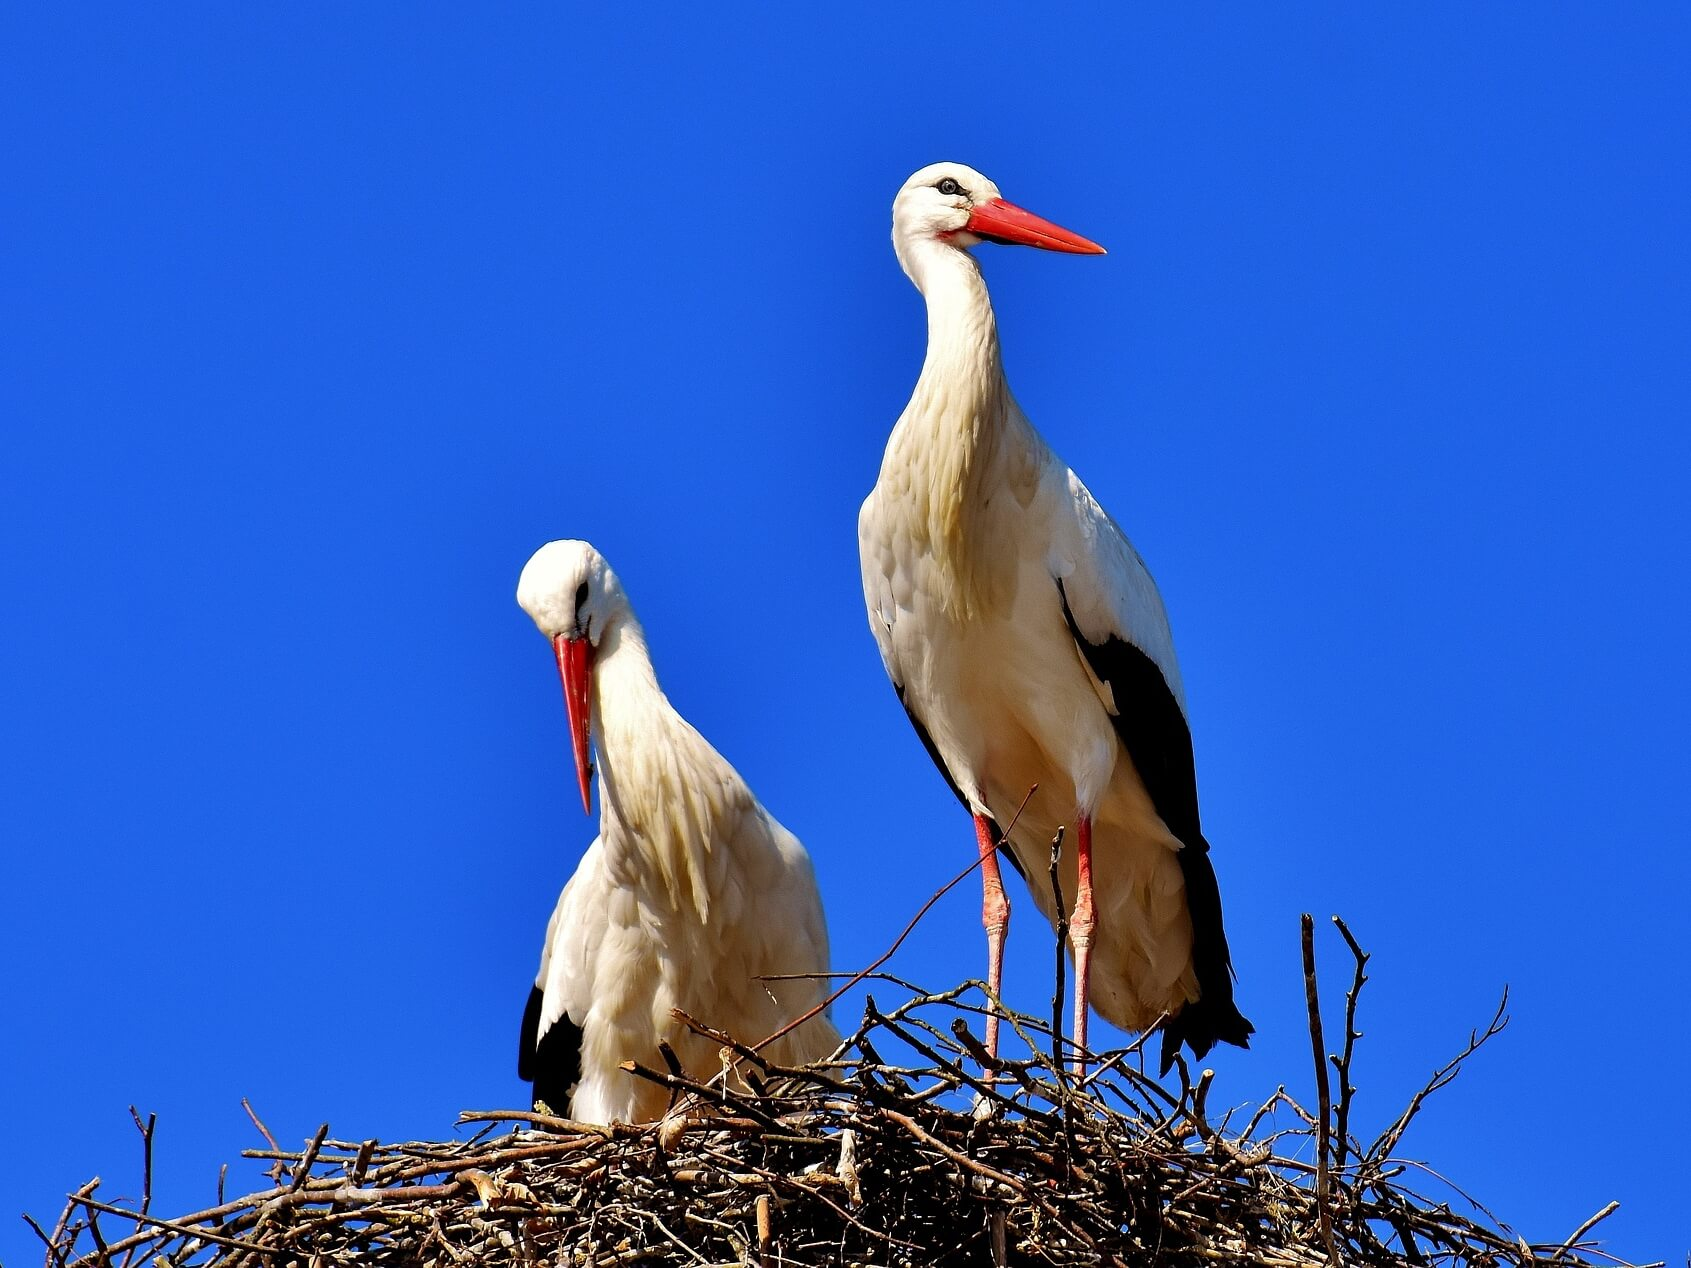 Storks in Altreu